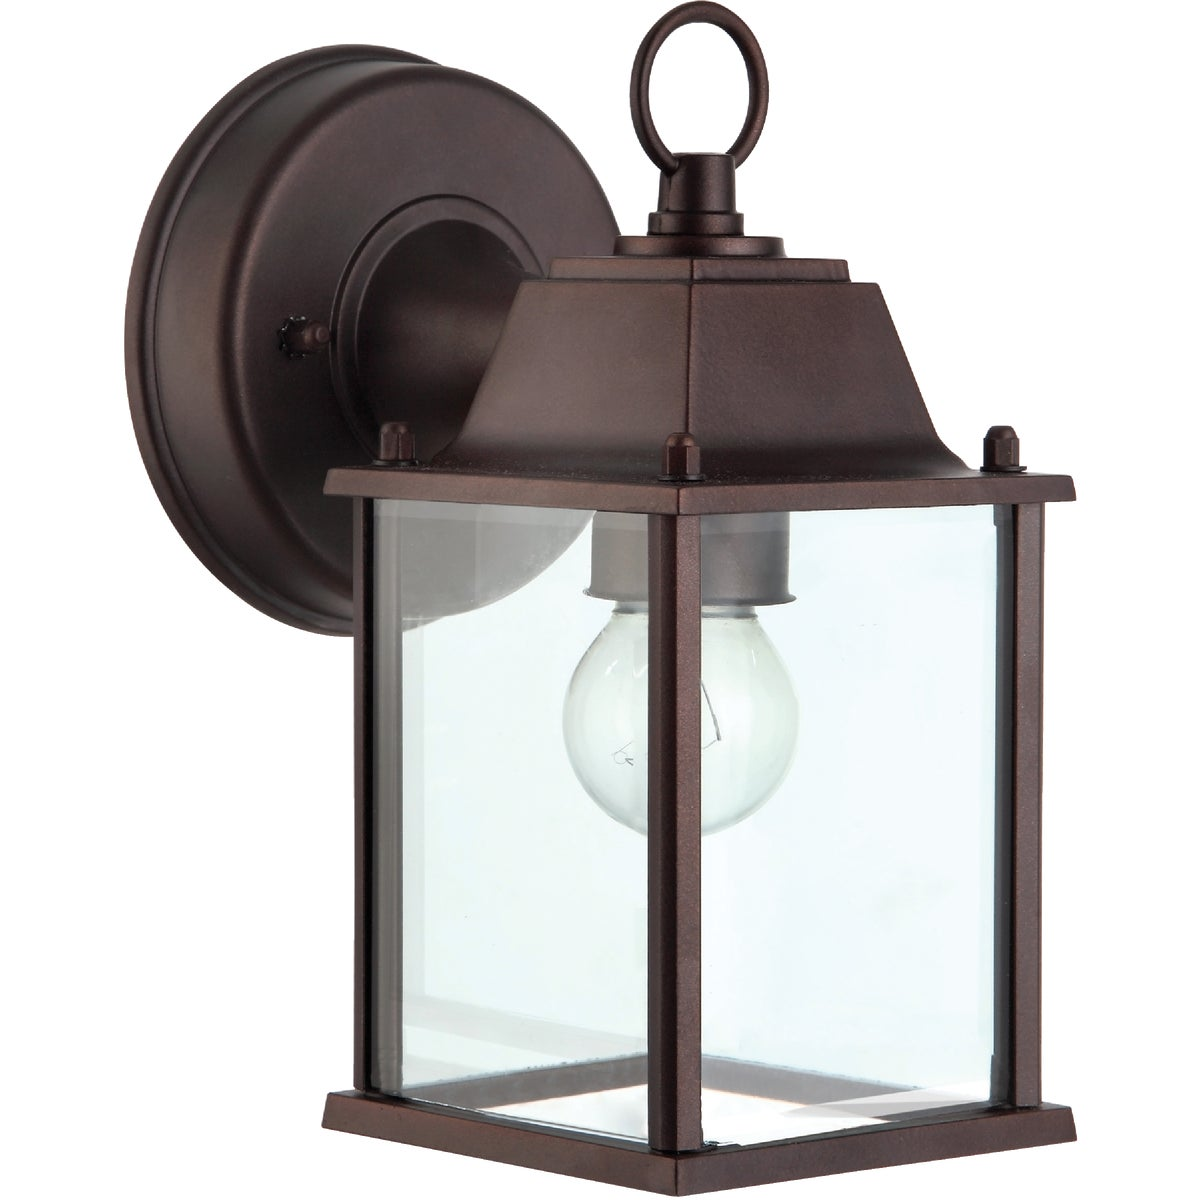 Westinghouse Lighting SIENNA OUTDOOR FIXTURE 66935